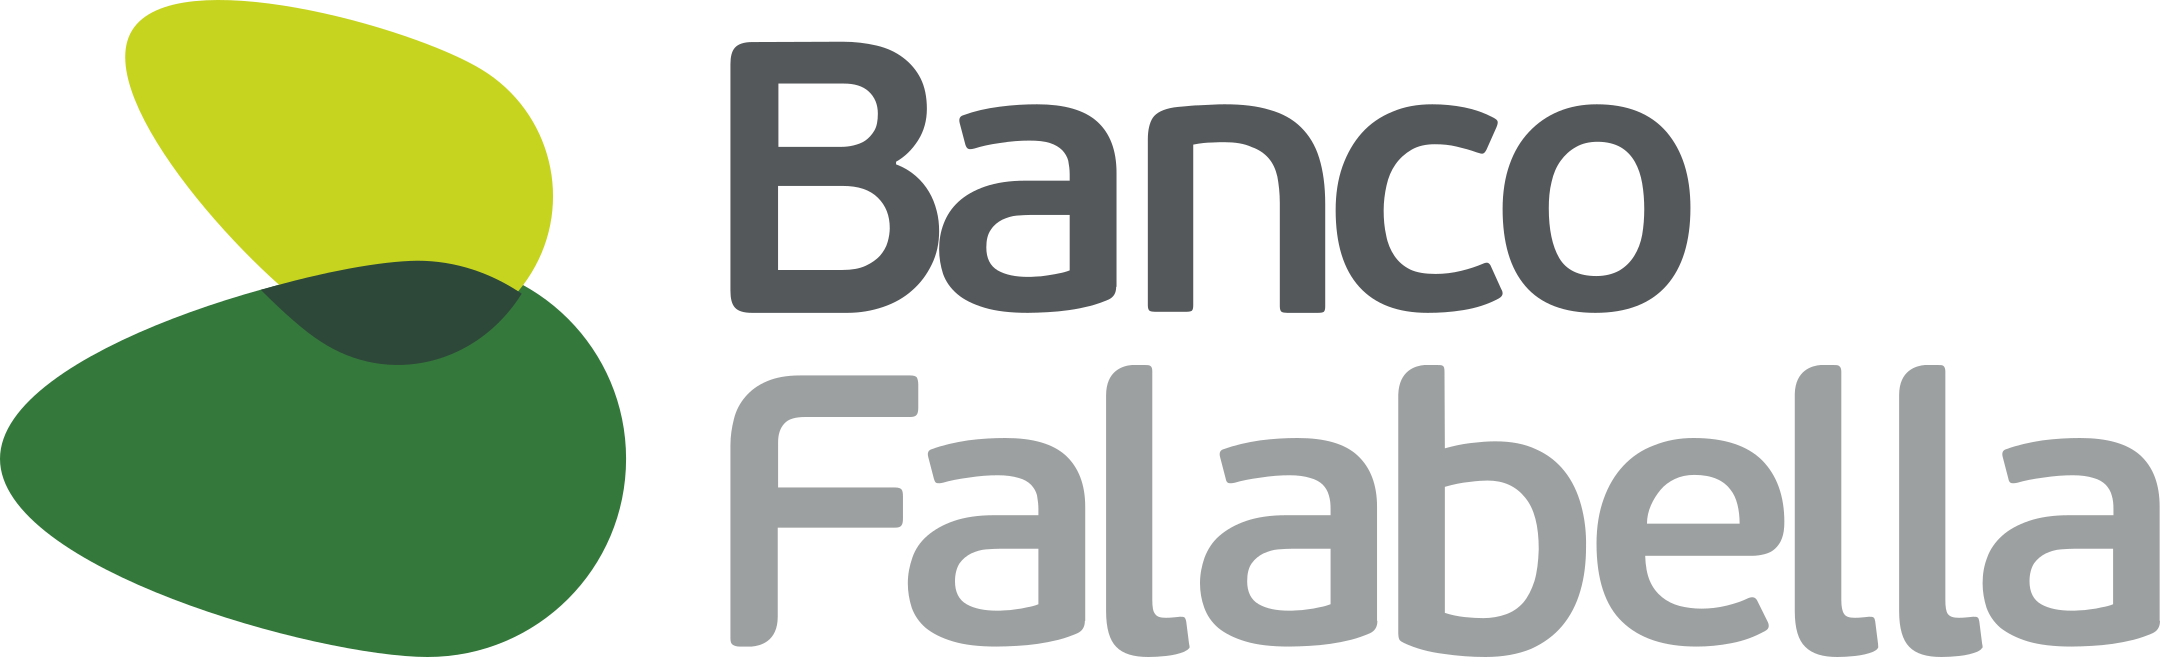 banco falabella logo 1 - Banco Falabella Logo